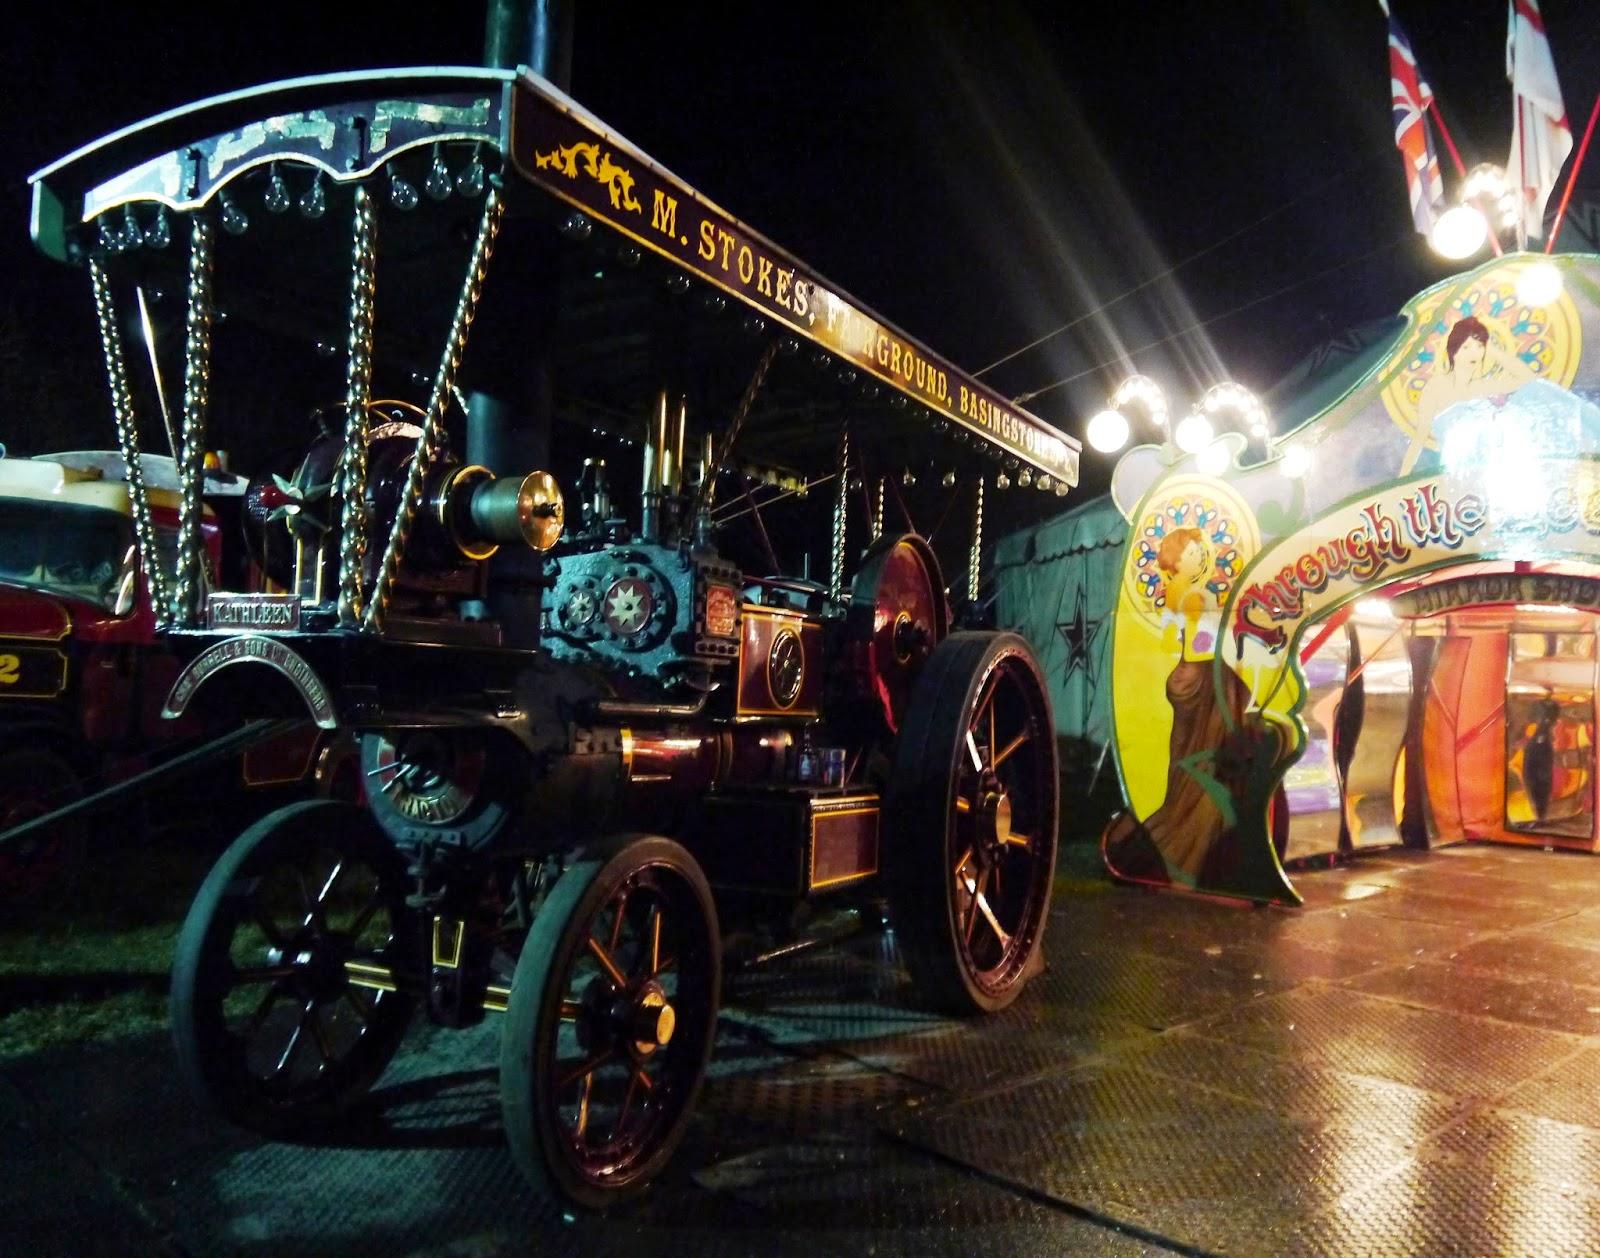 Carters Steam Fair Wedding - Steam Engine